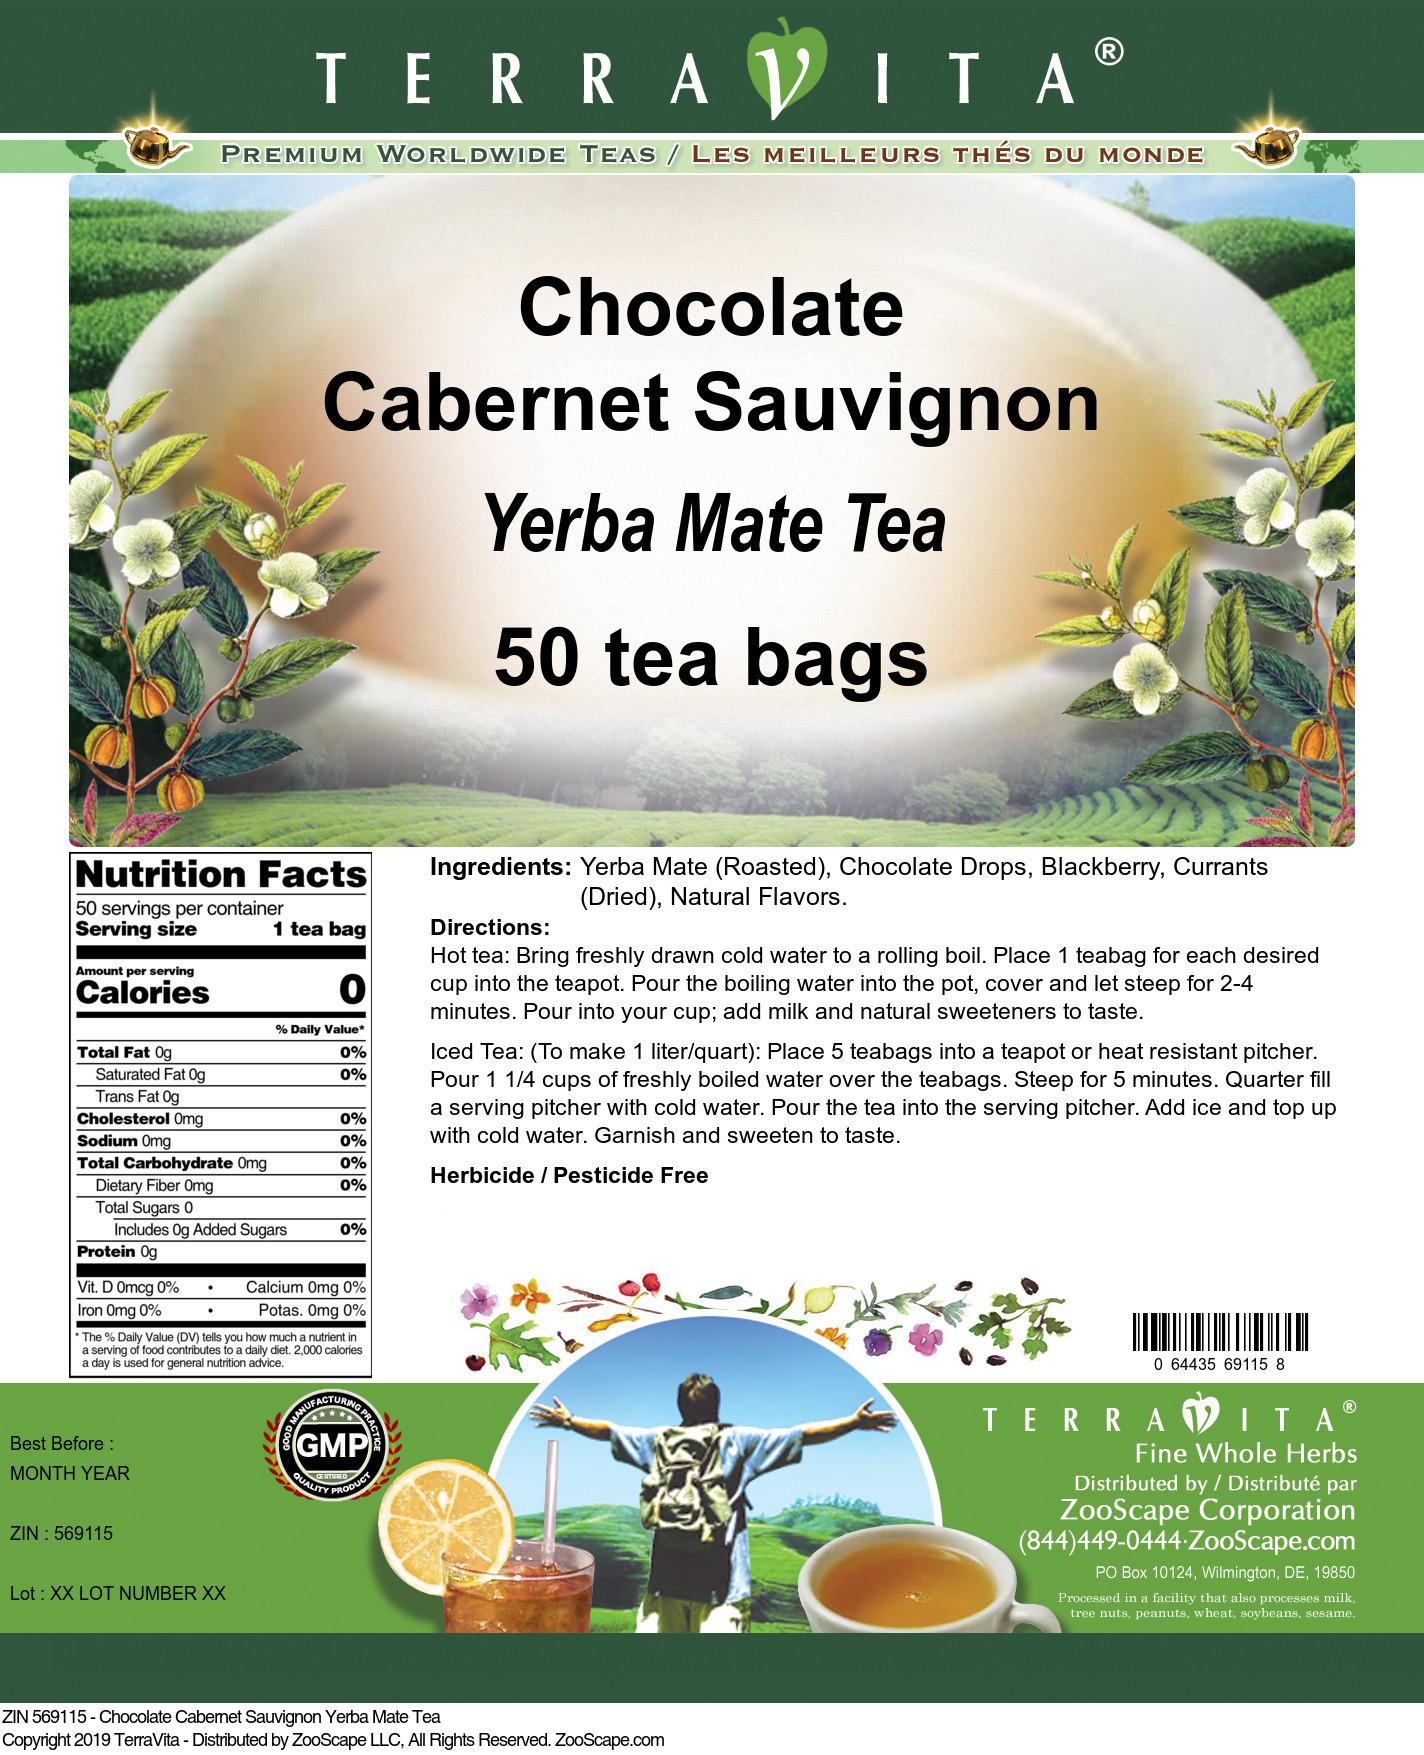 Chocolate Cabernet Sauvignon Yerba Mate